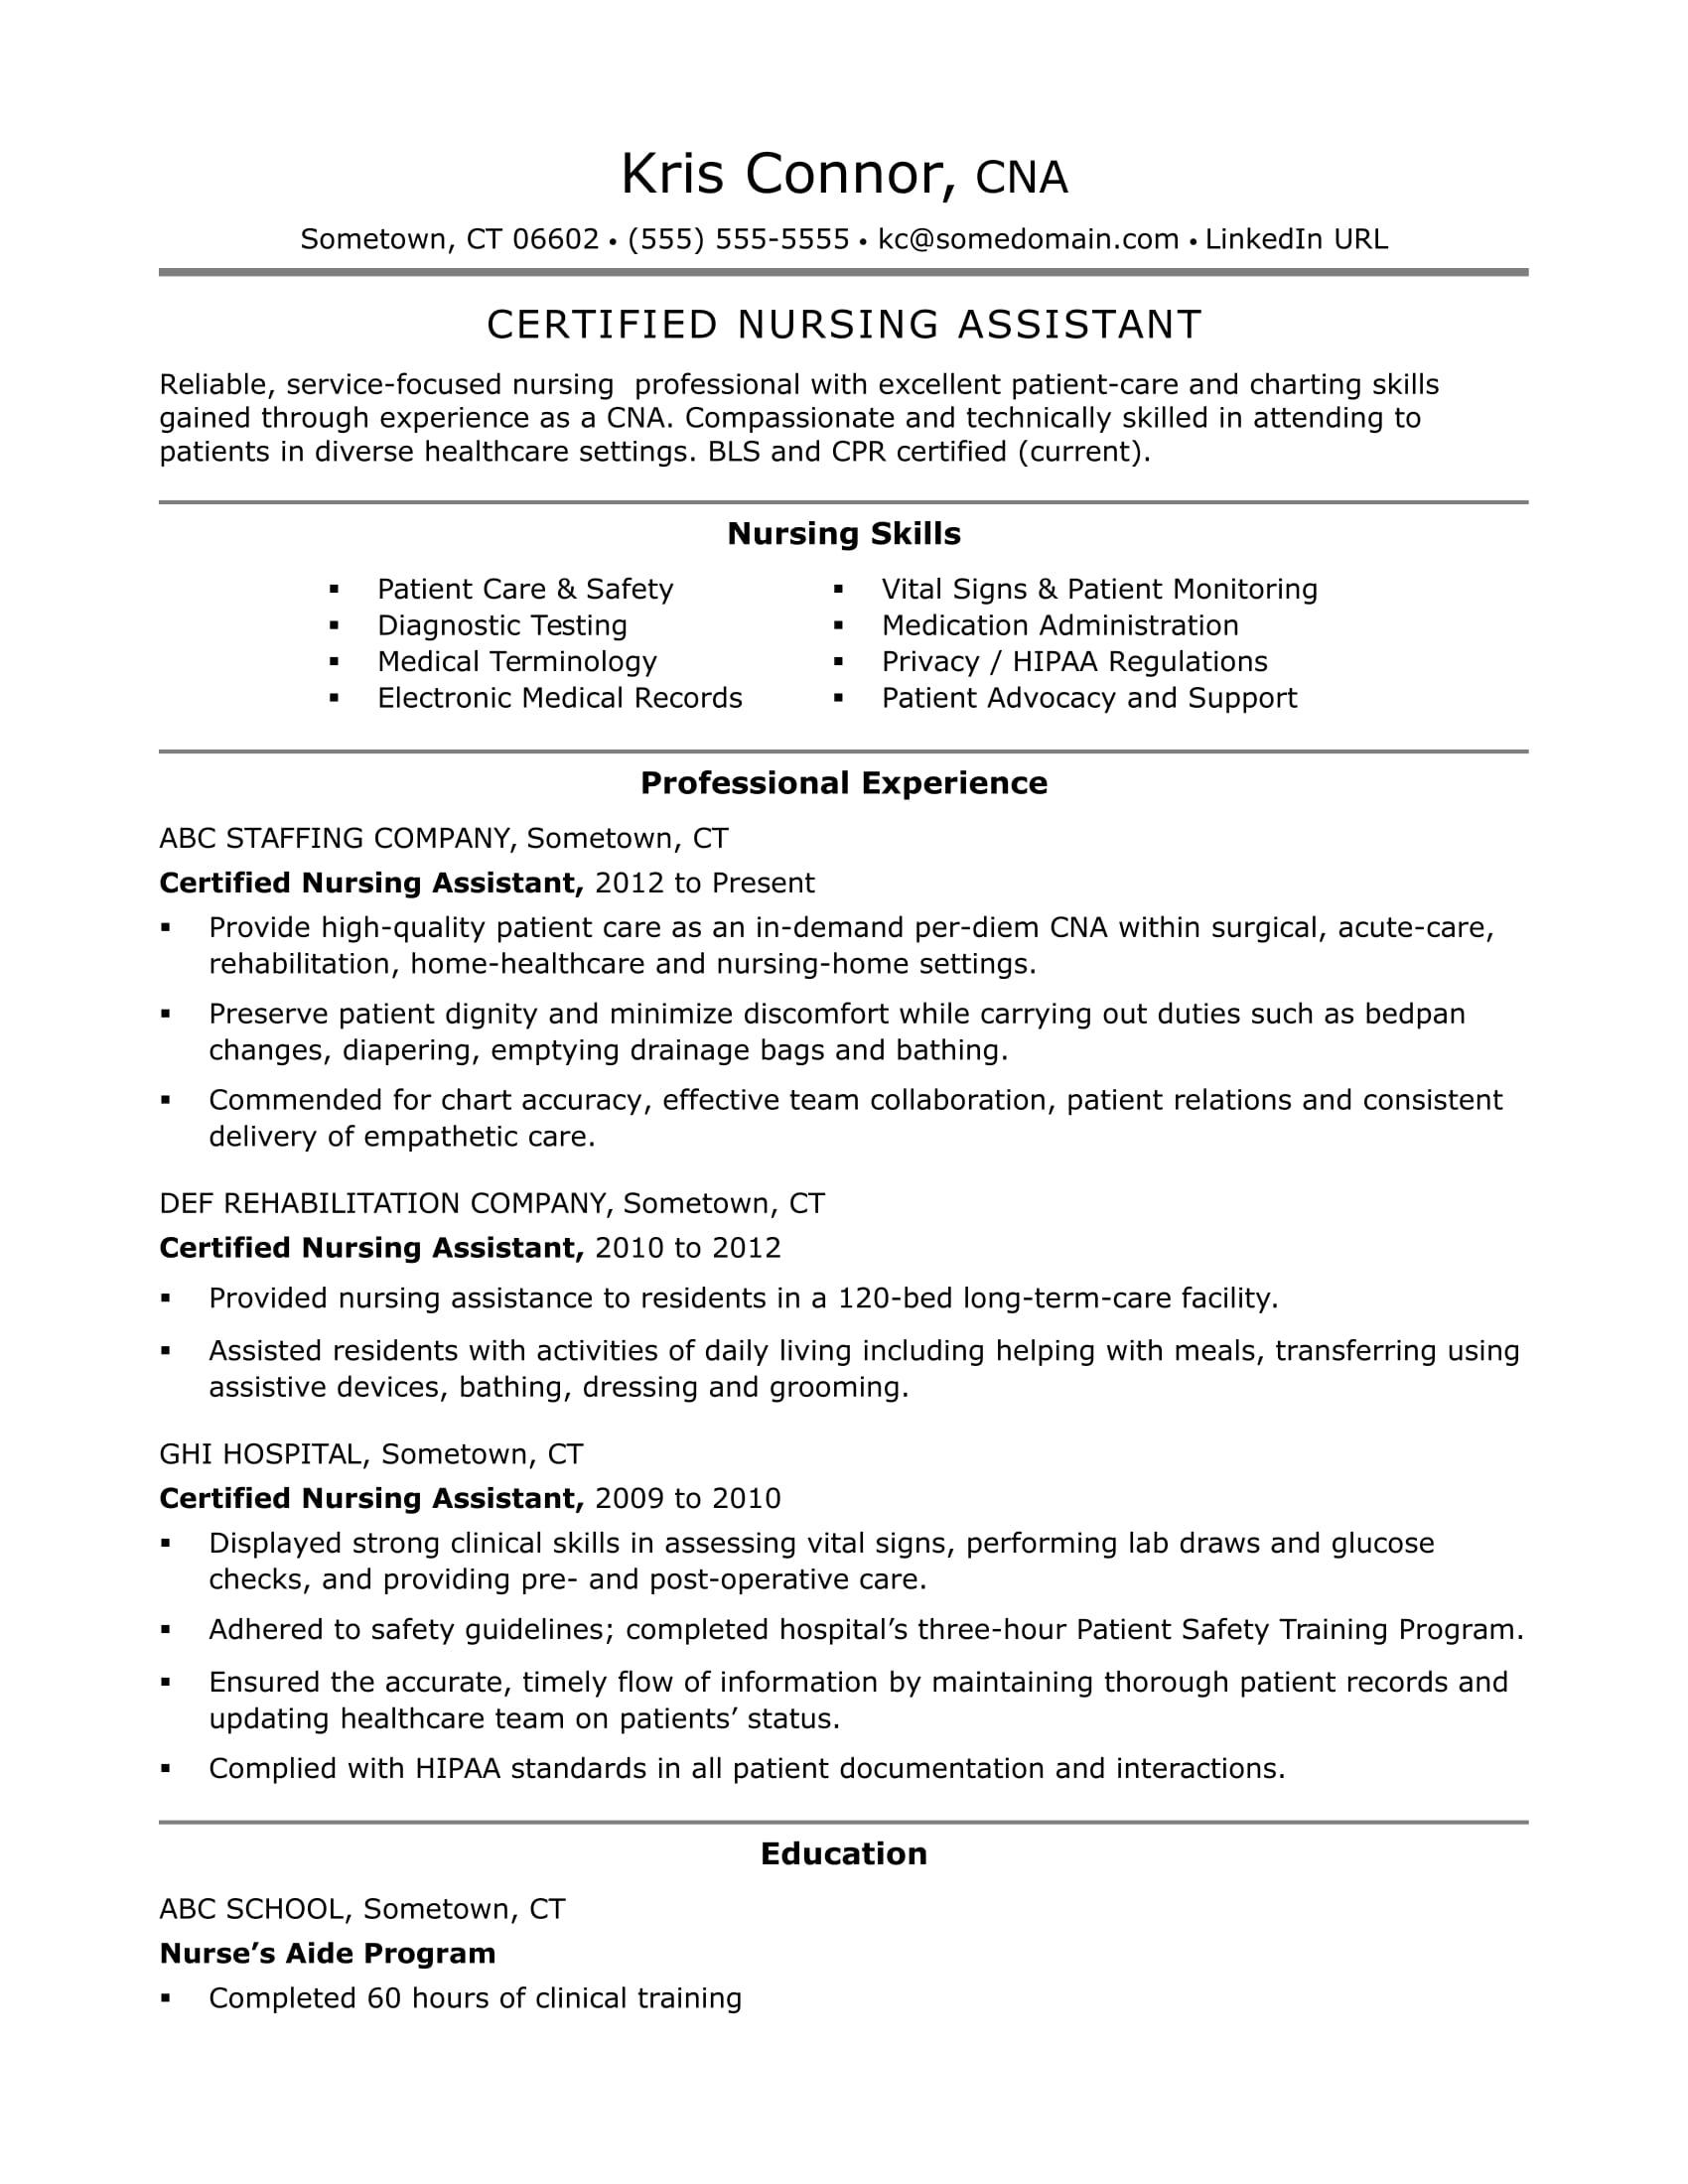 Nursing Assistant Resume Templates